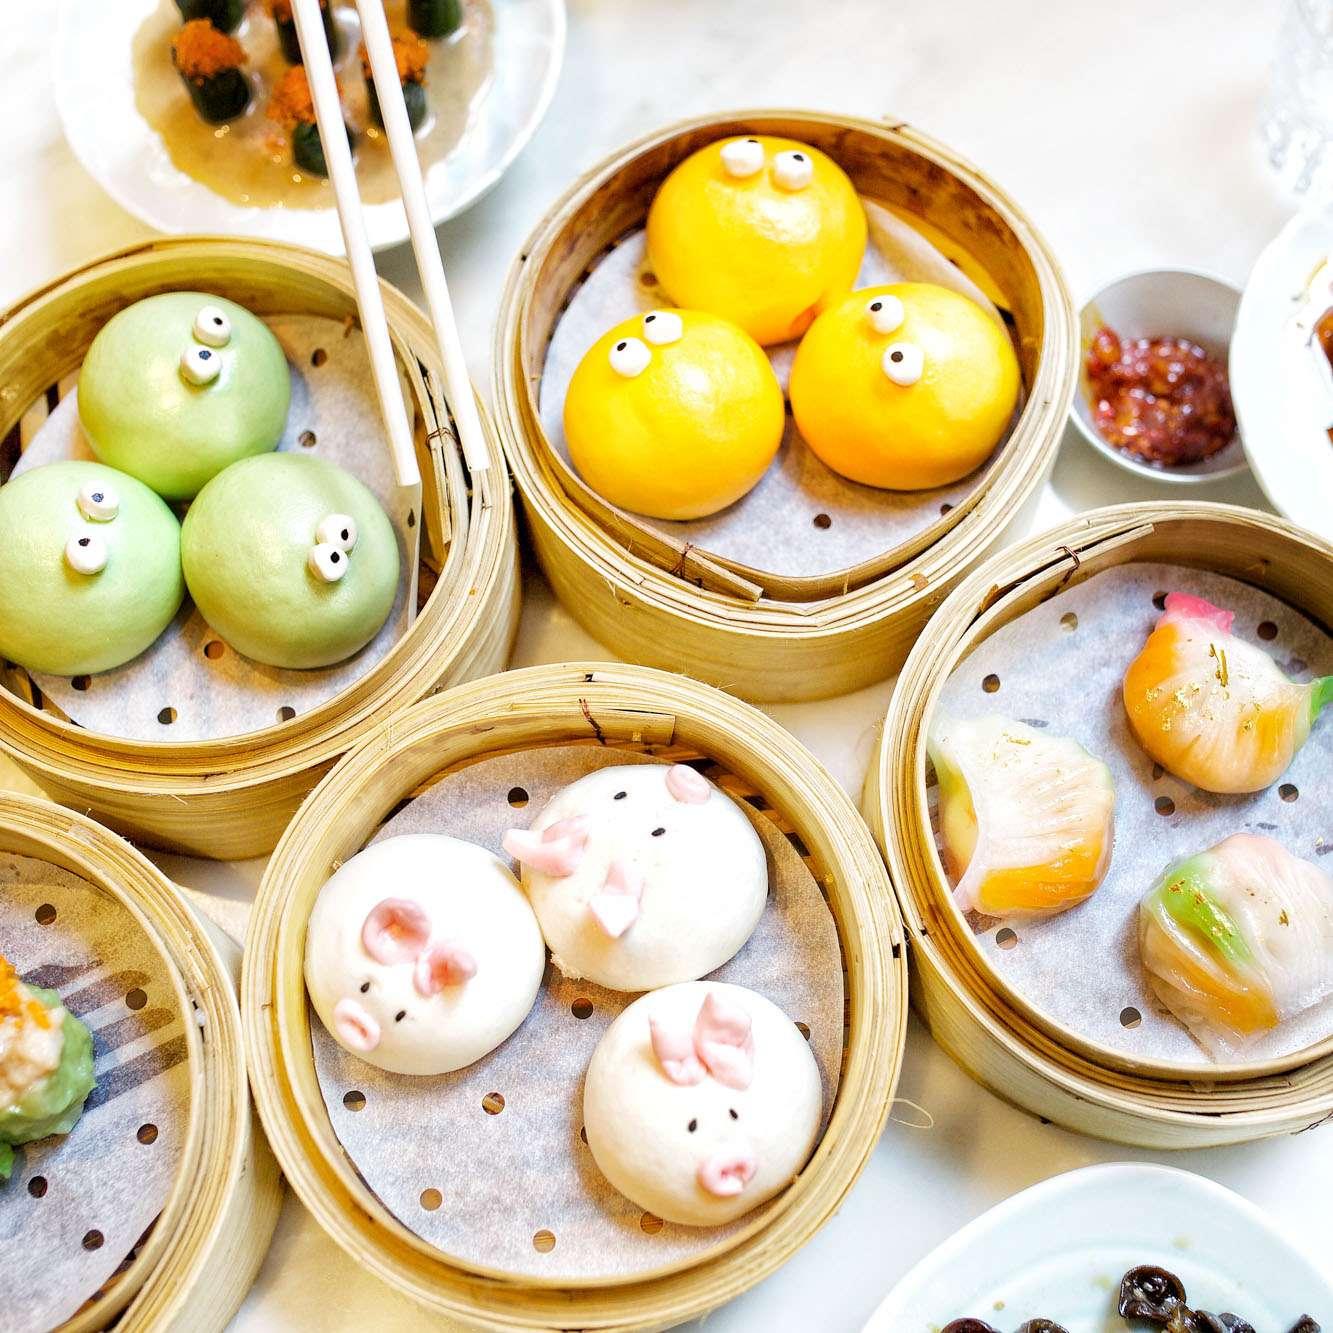 Cute Yum Cha - Dim Sum - Hong Kong